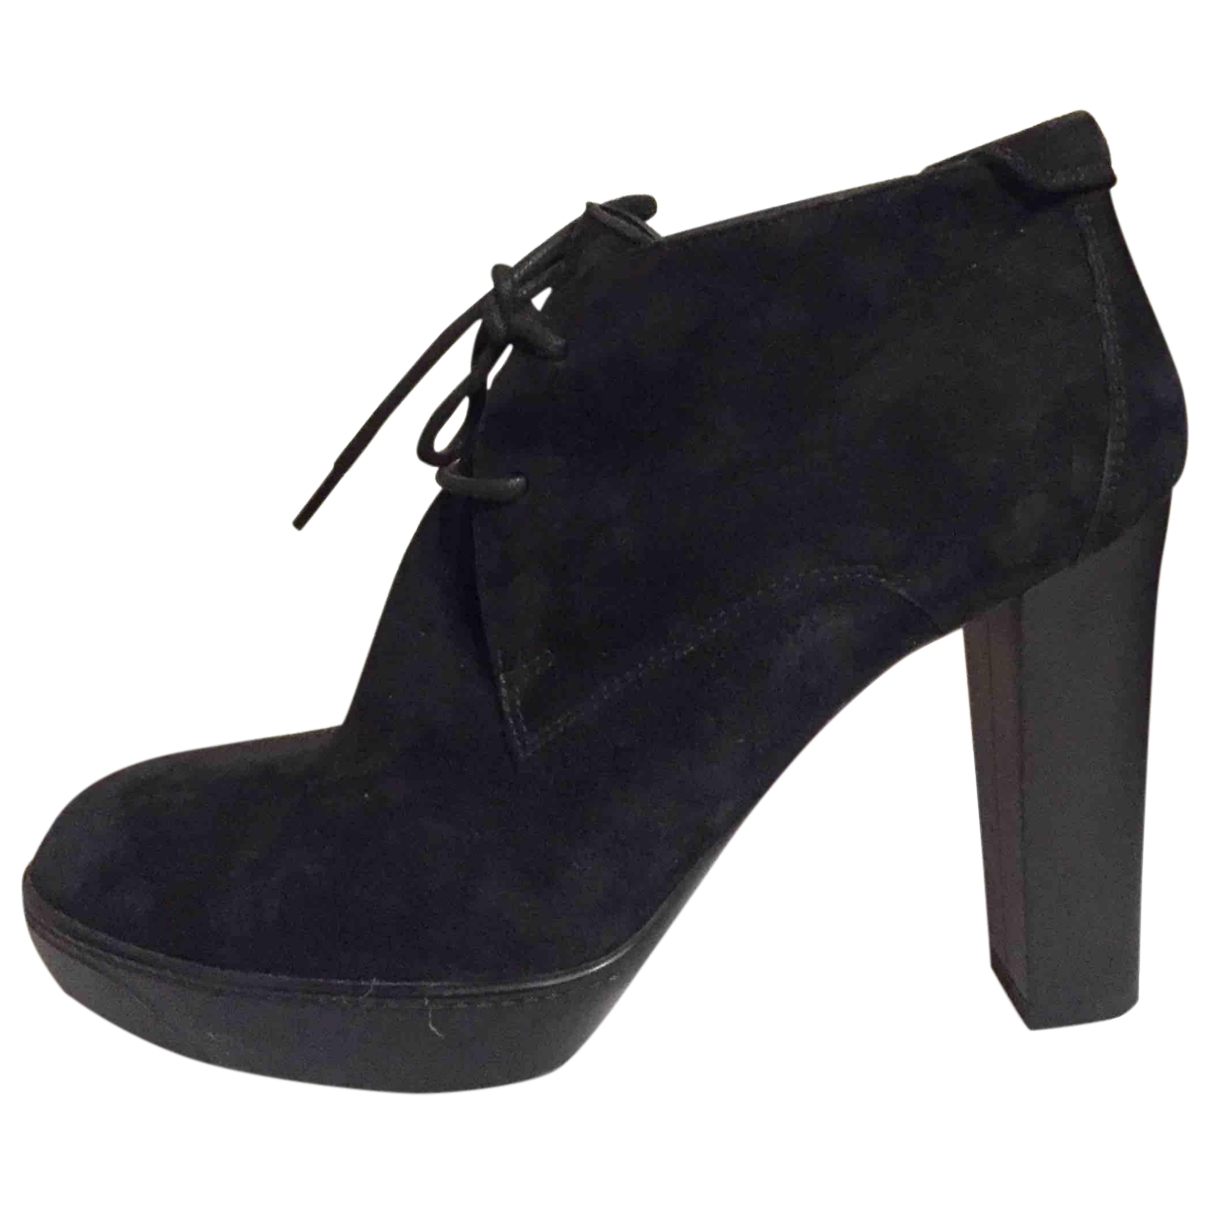 Hogan \N Black Suede Ankle boots for Women 38 EU